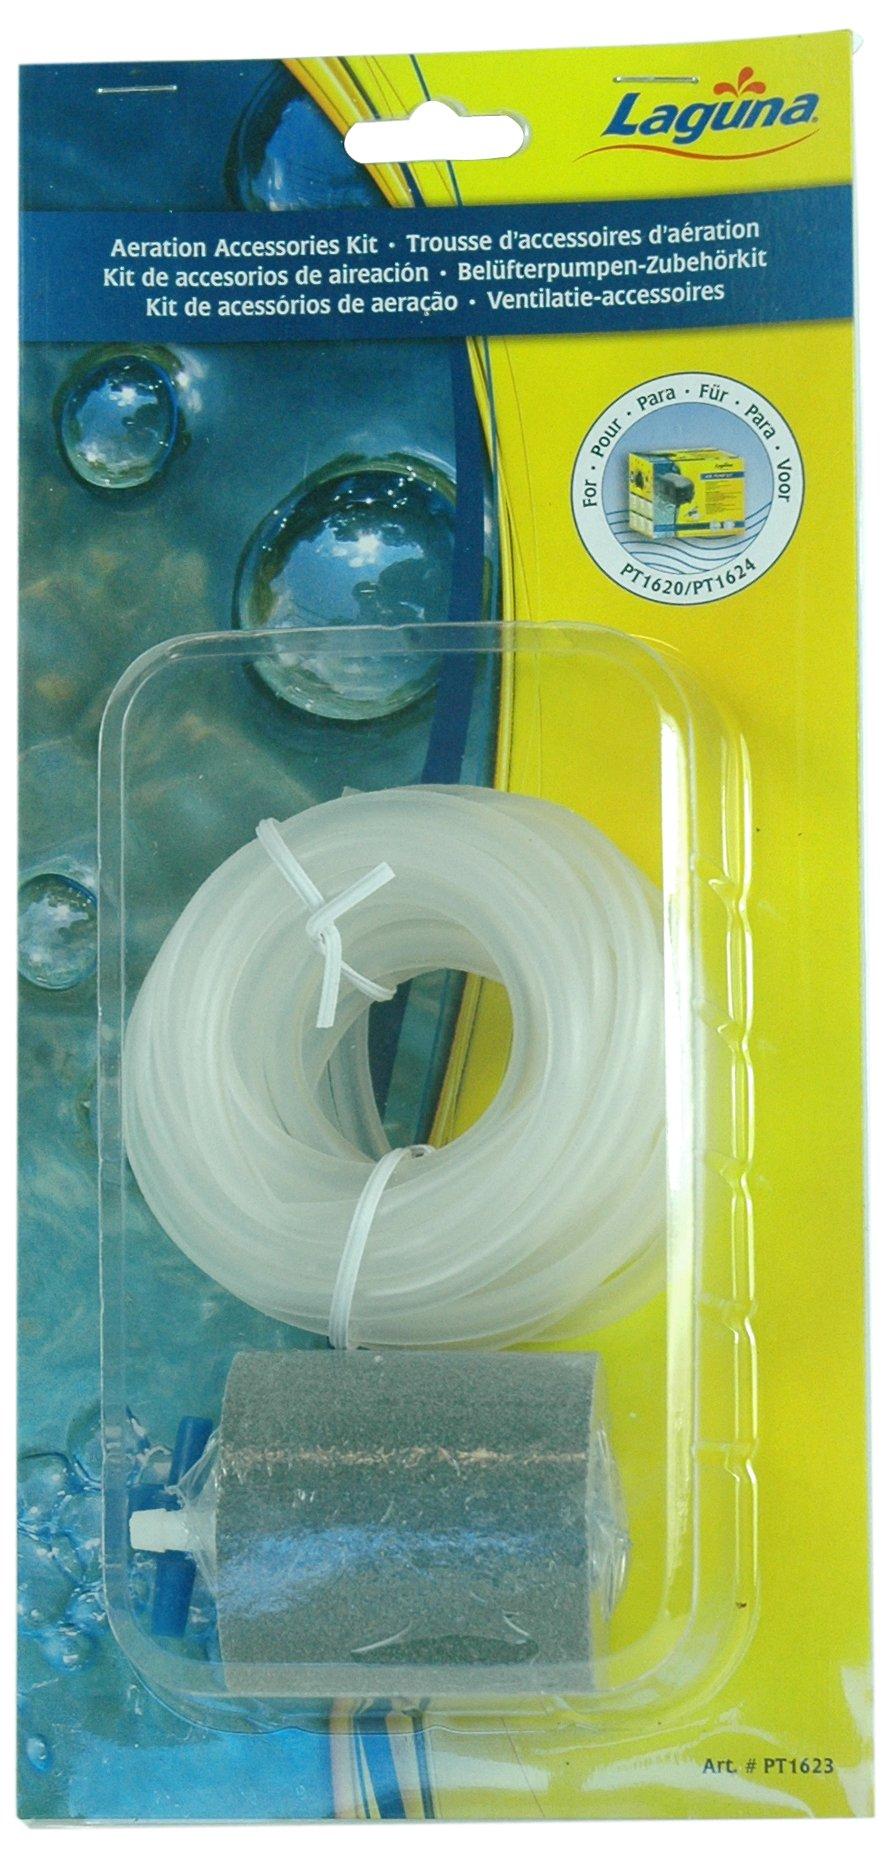 Laguna Aeration Accessories Kit for Ponds